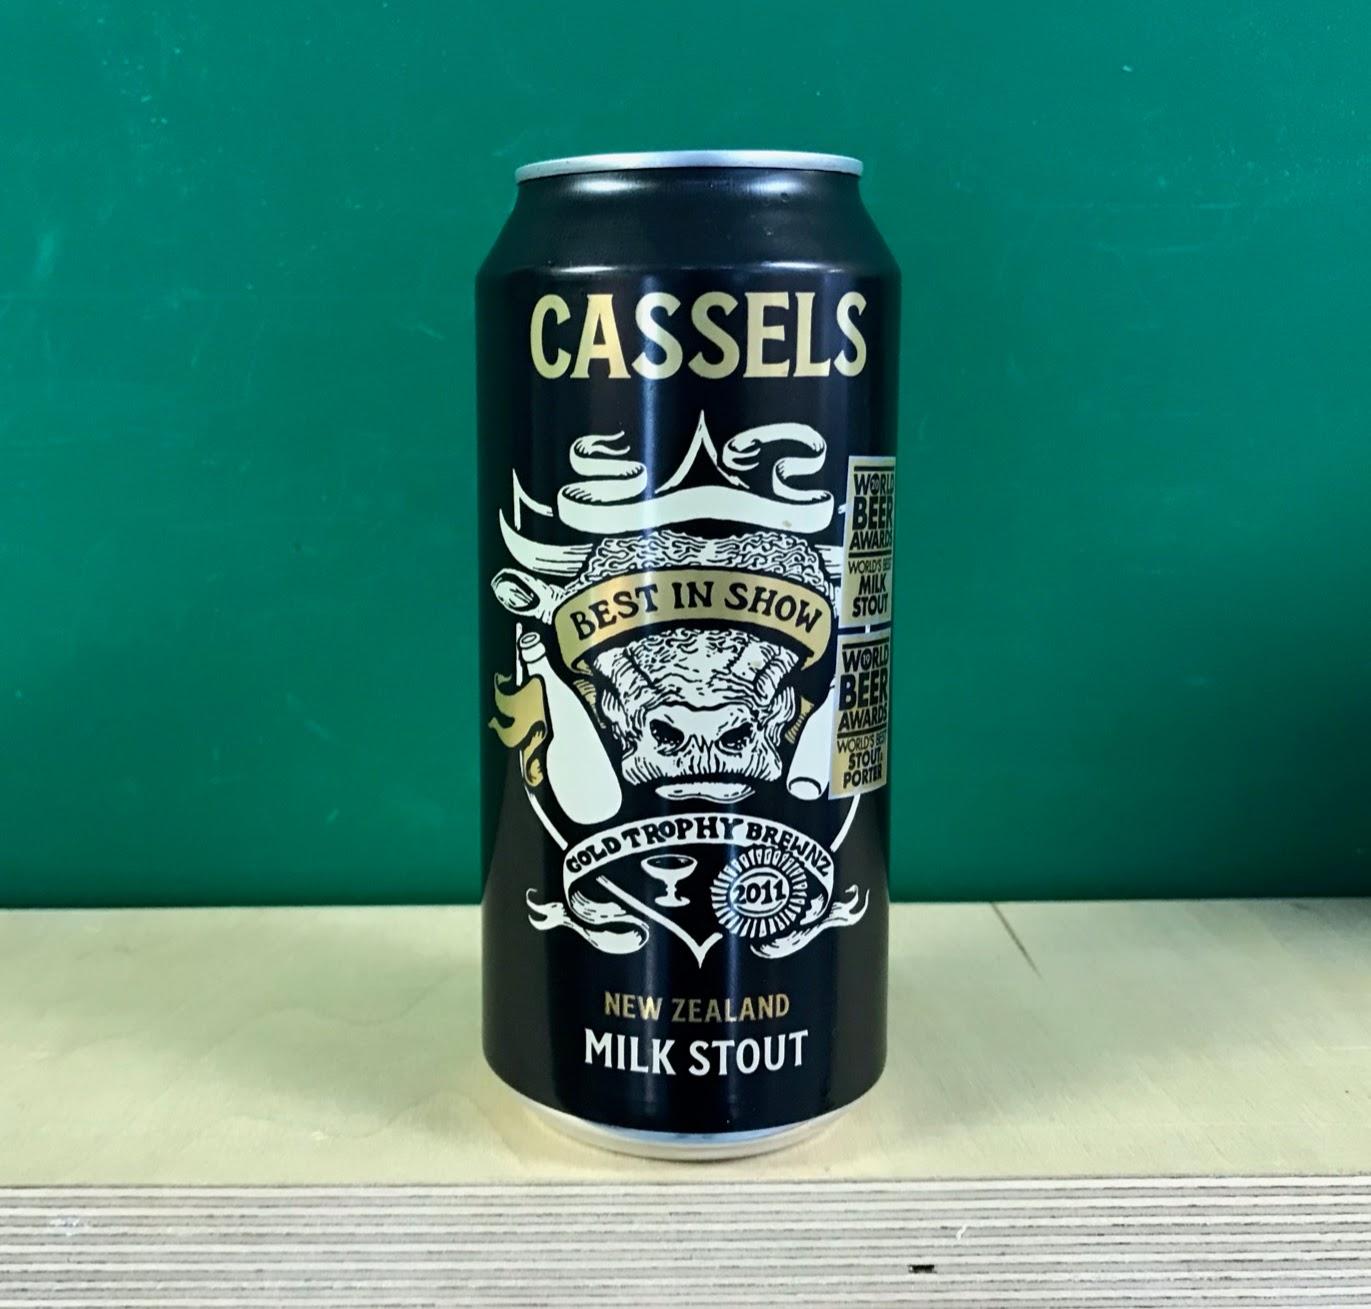 Cassels Milk Stout